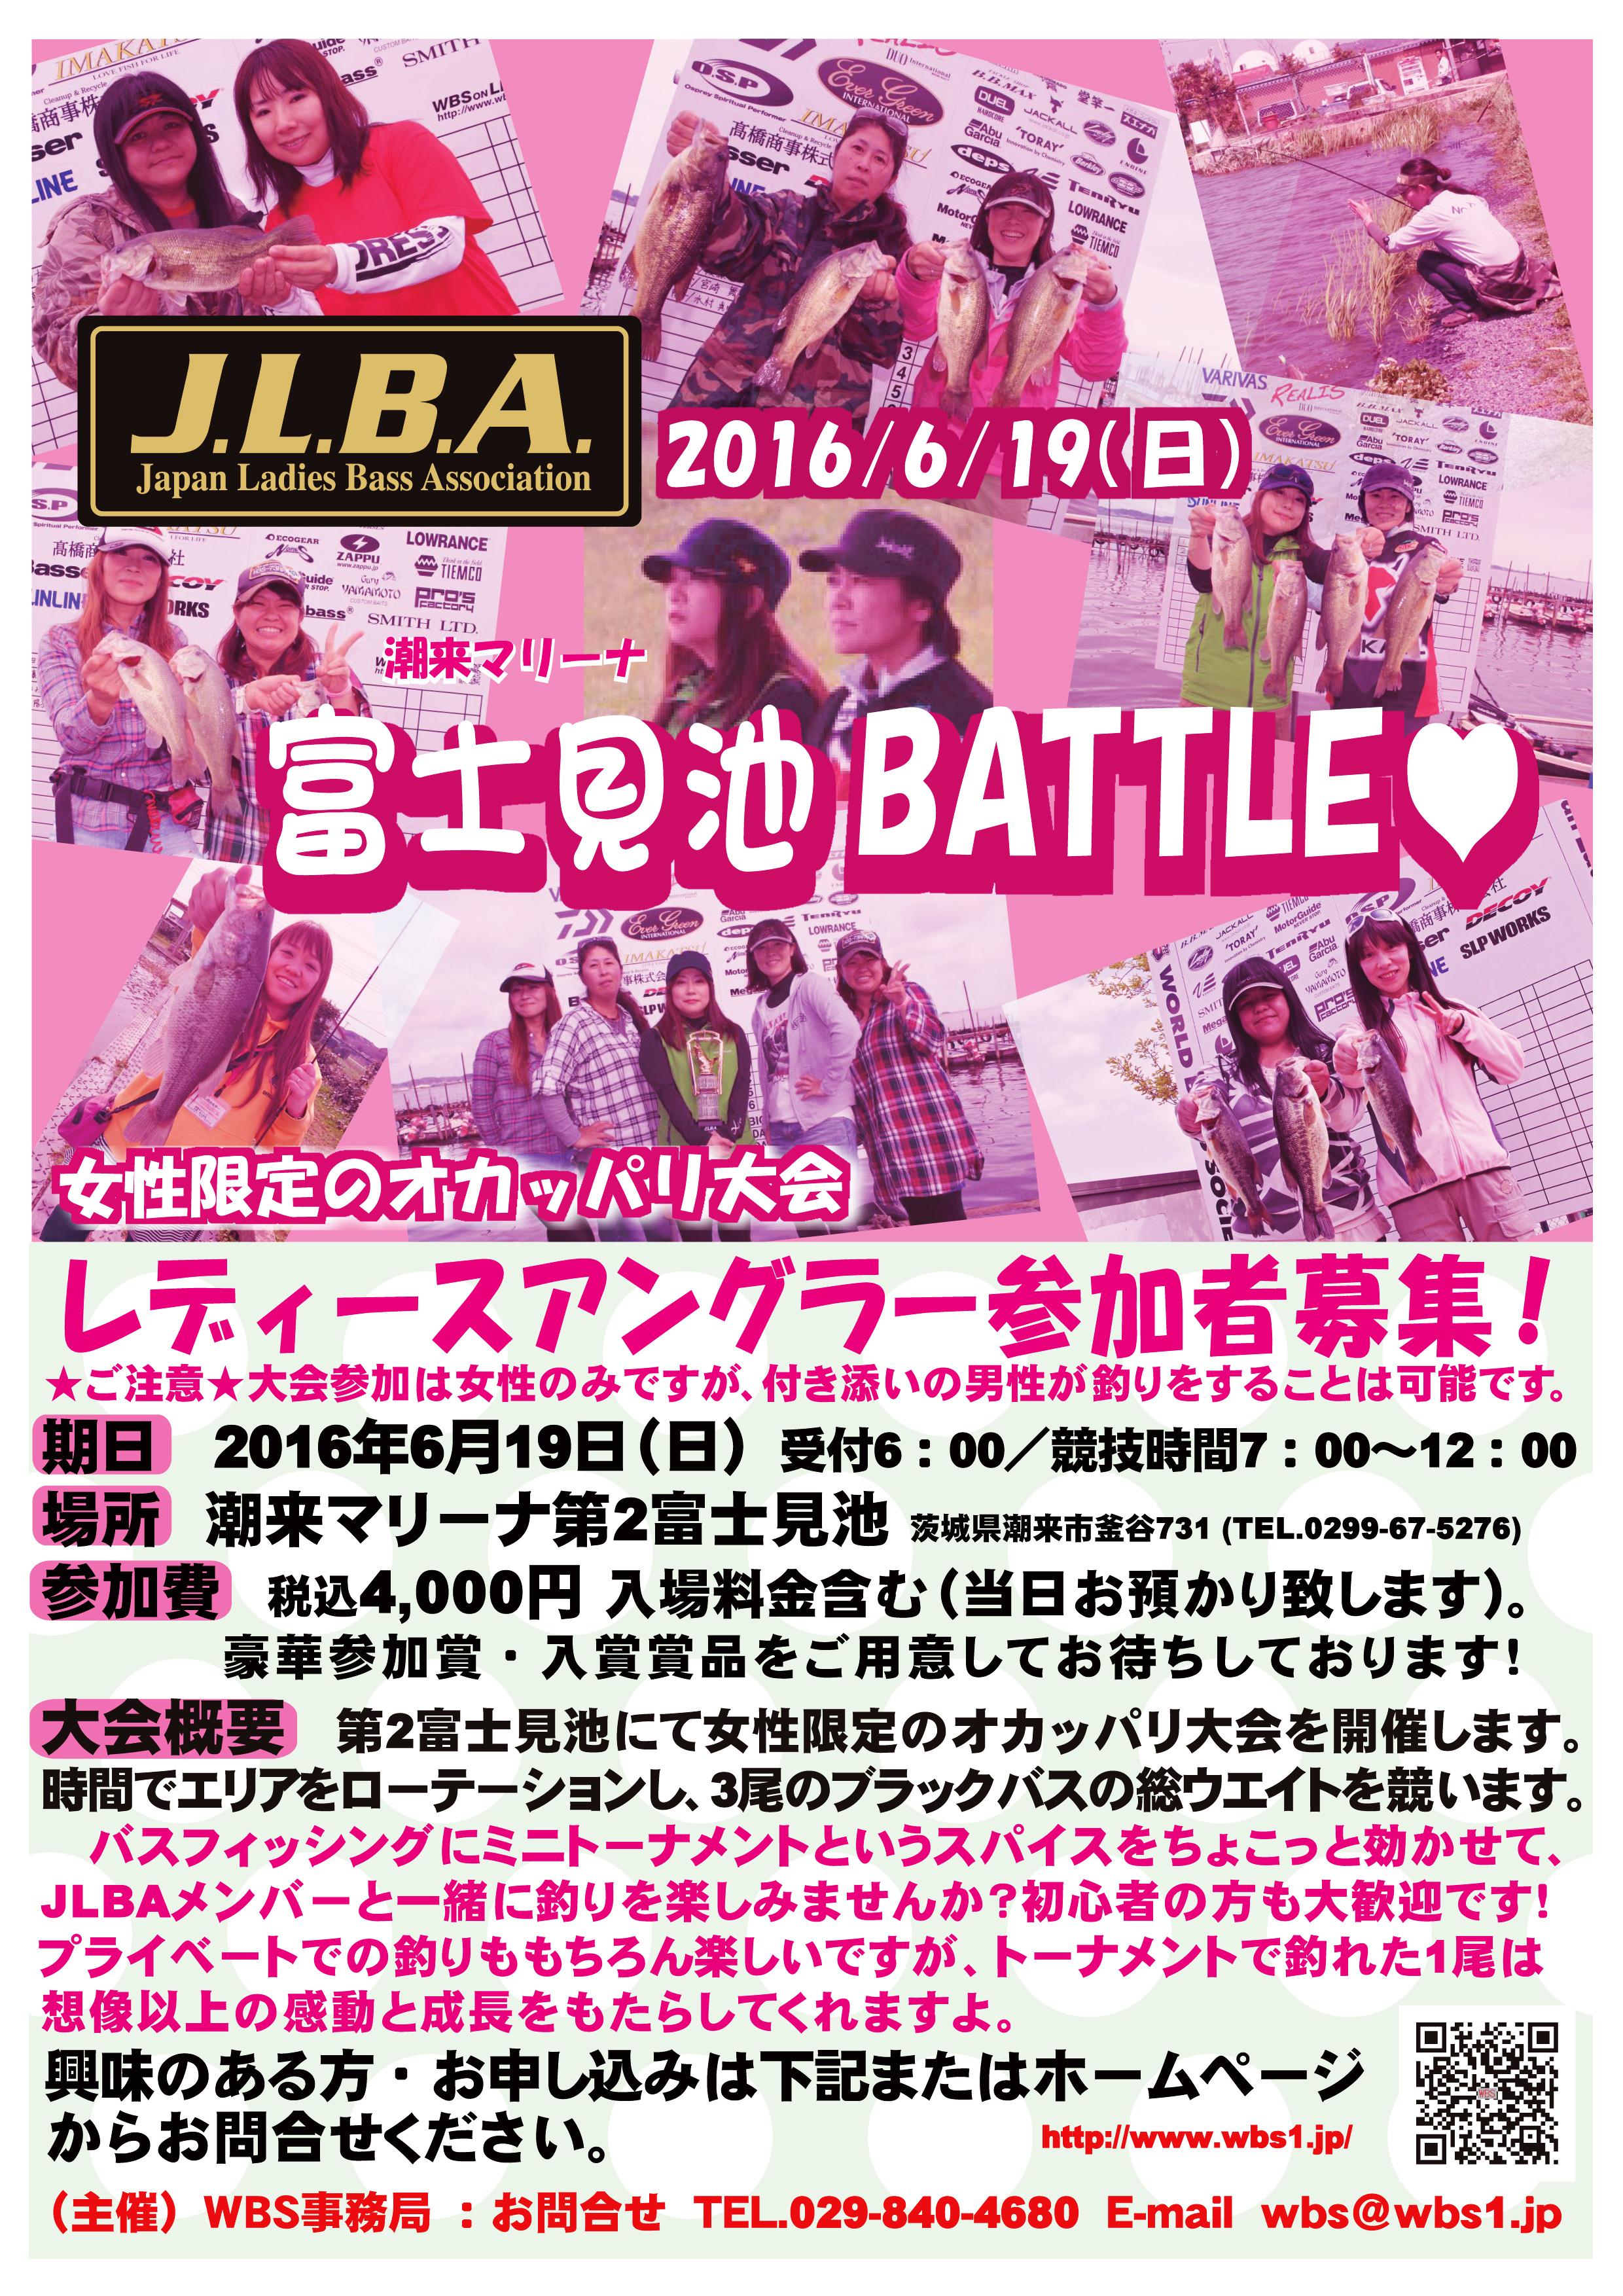 JLBA富士見池BATTLE2016